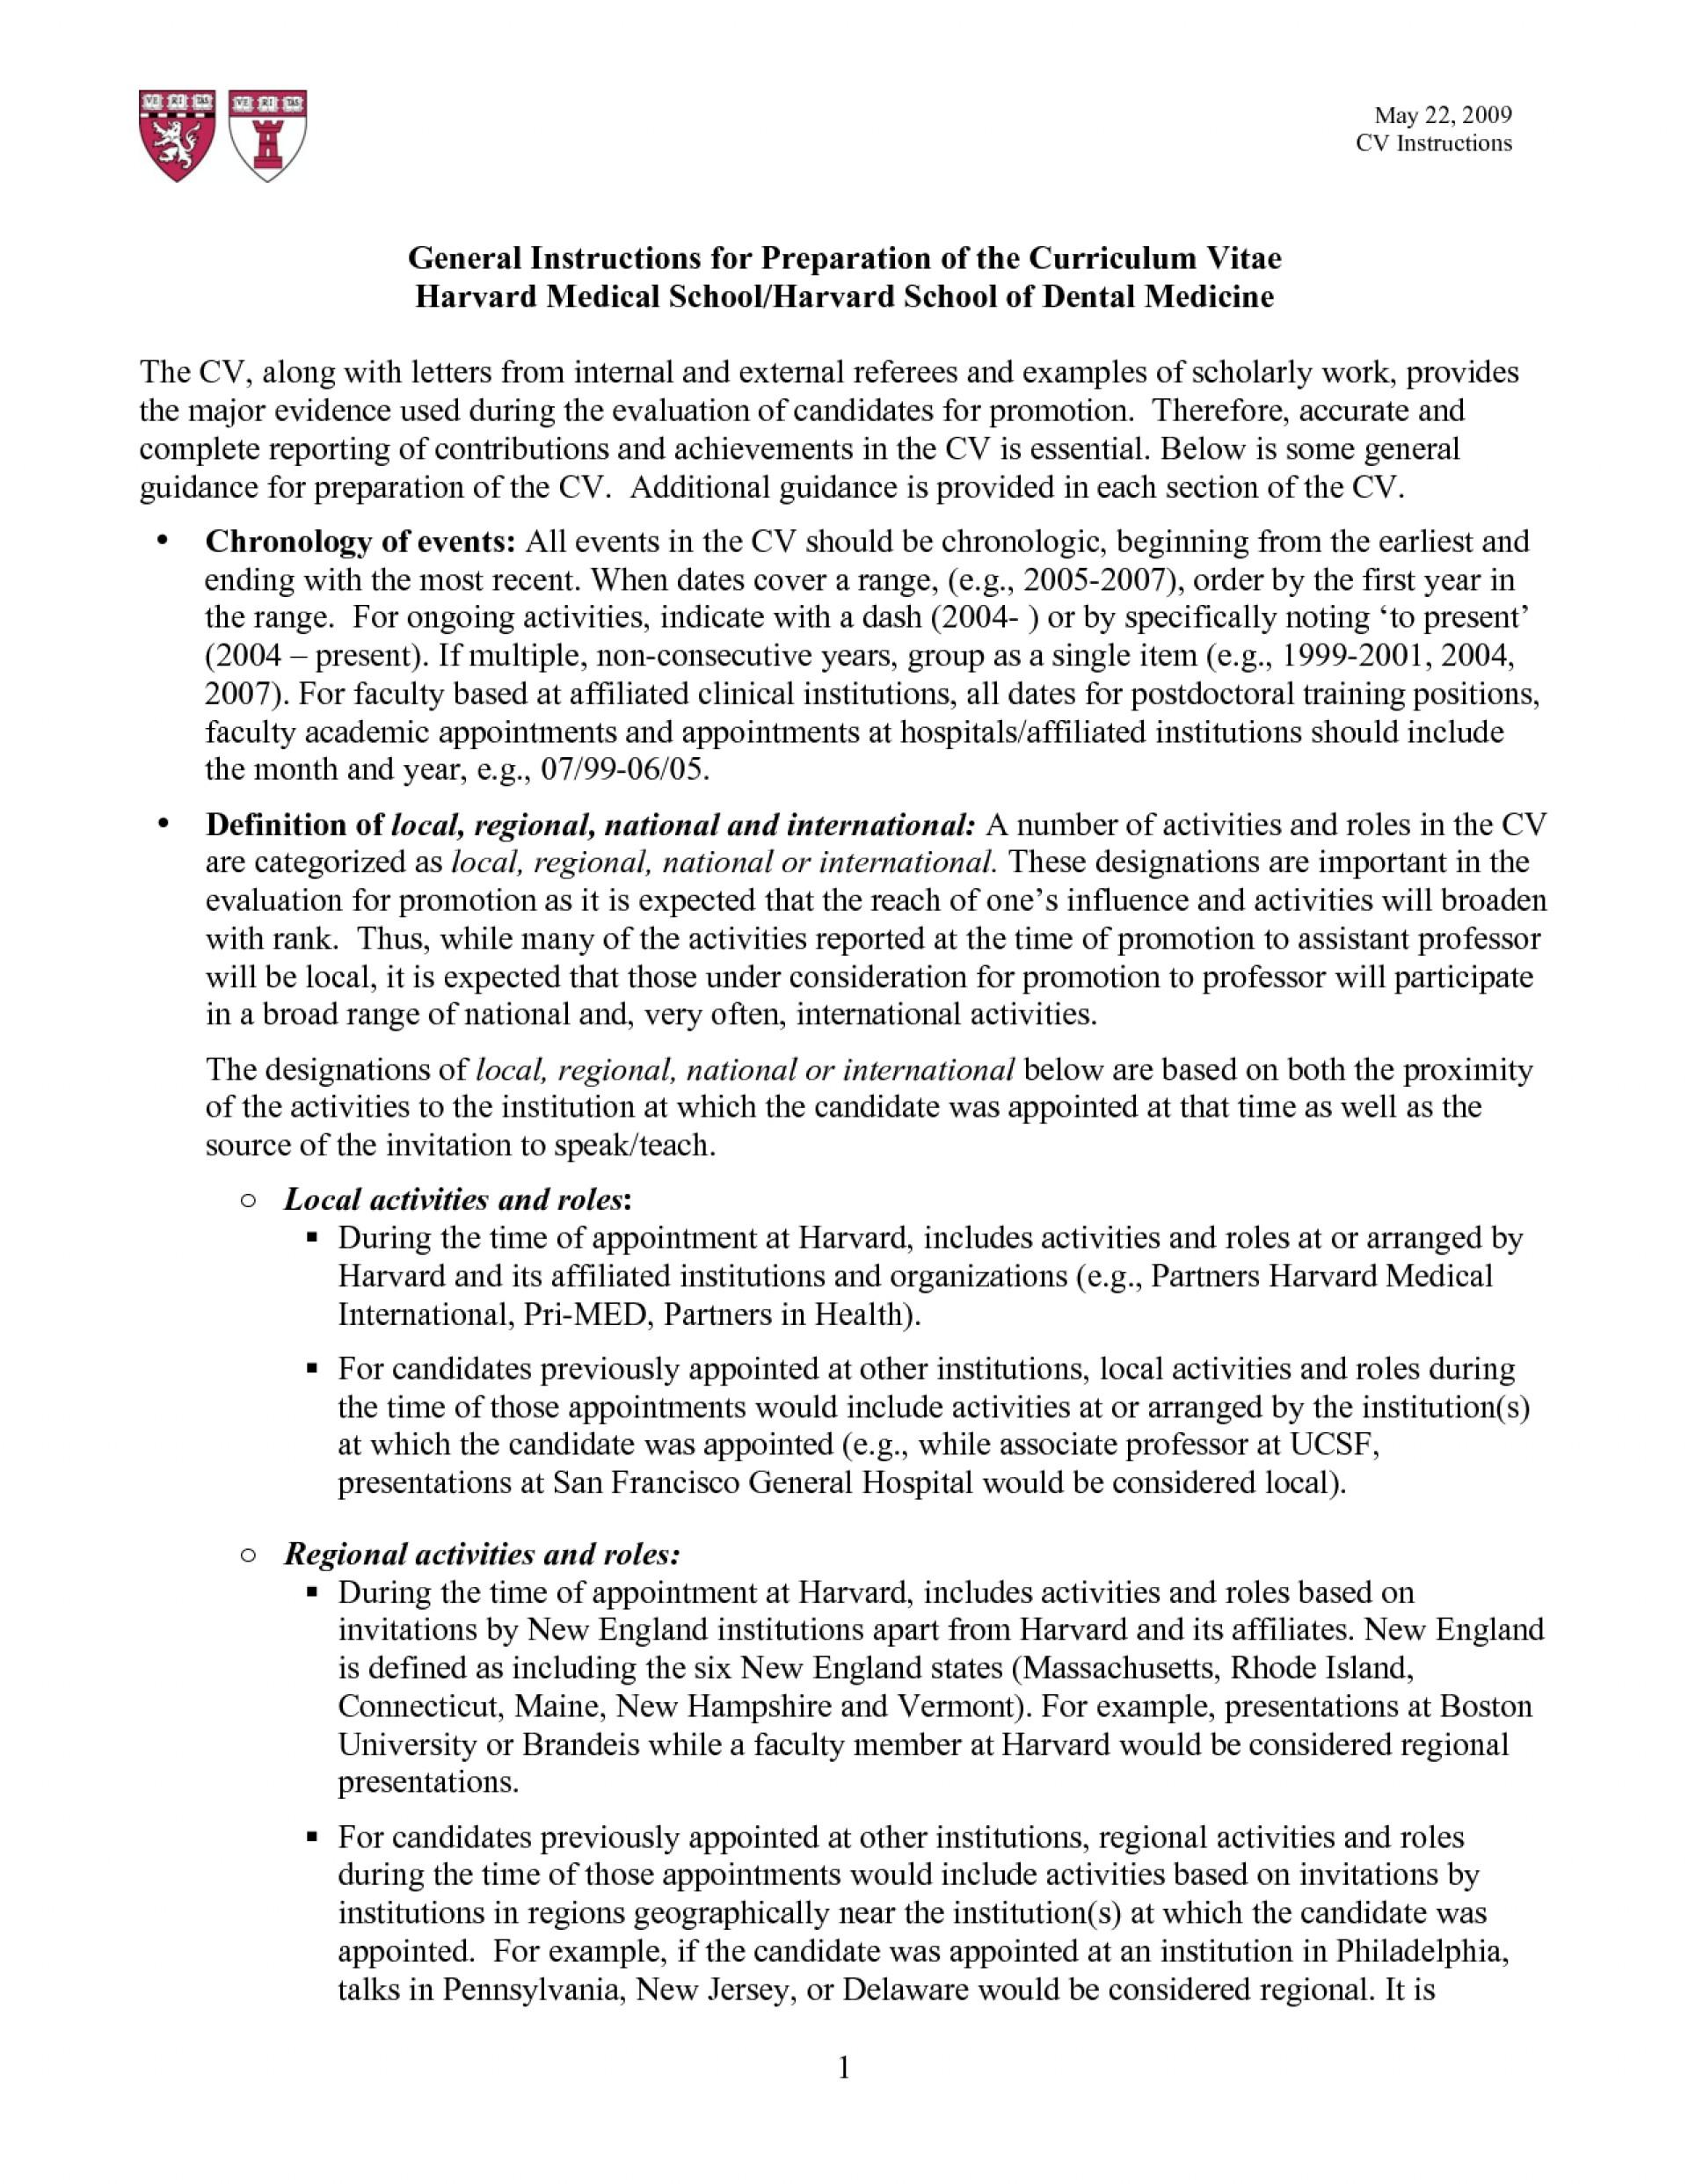 011 Harvard Accepted Essays Essay Example Cv Template Medical School Fantastic Business Reddit College Book 1920